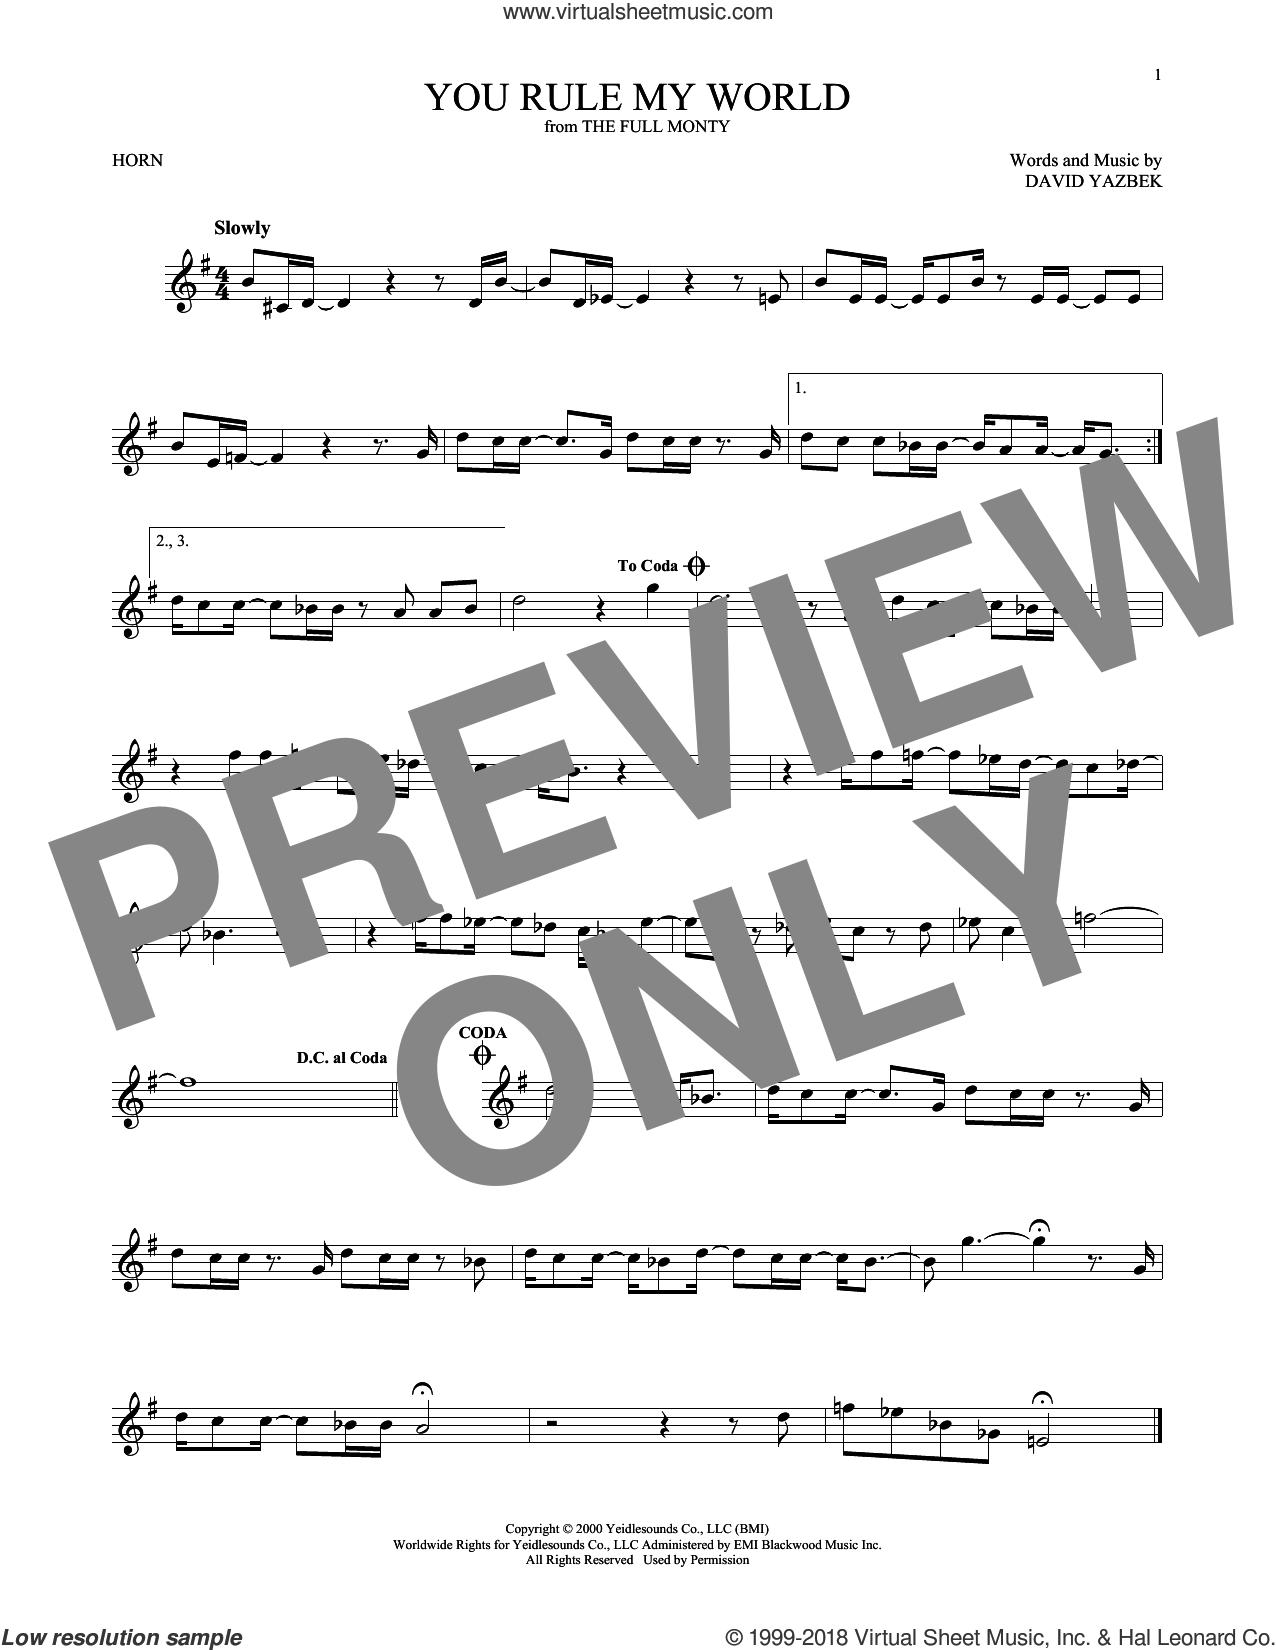 You Rule My World sheet music for horn solo by David Yazbek, intermediate skill level